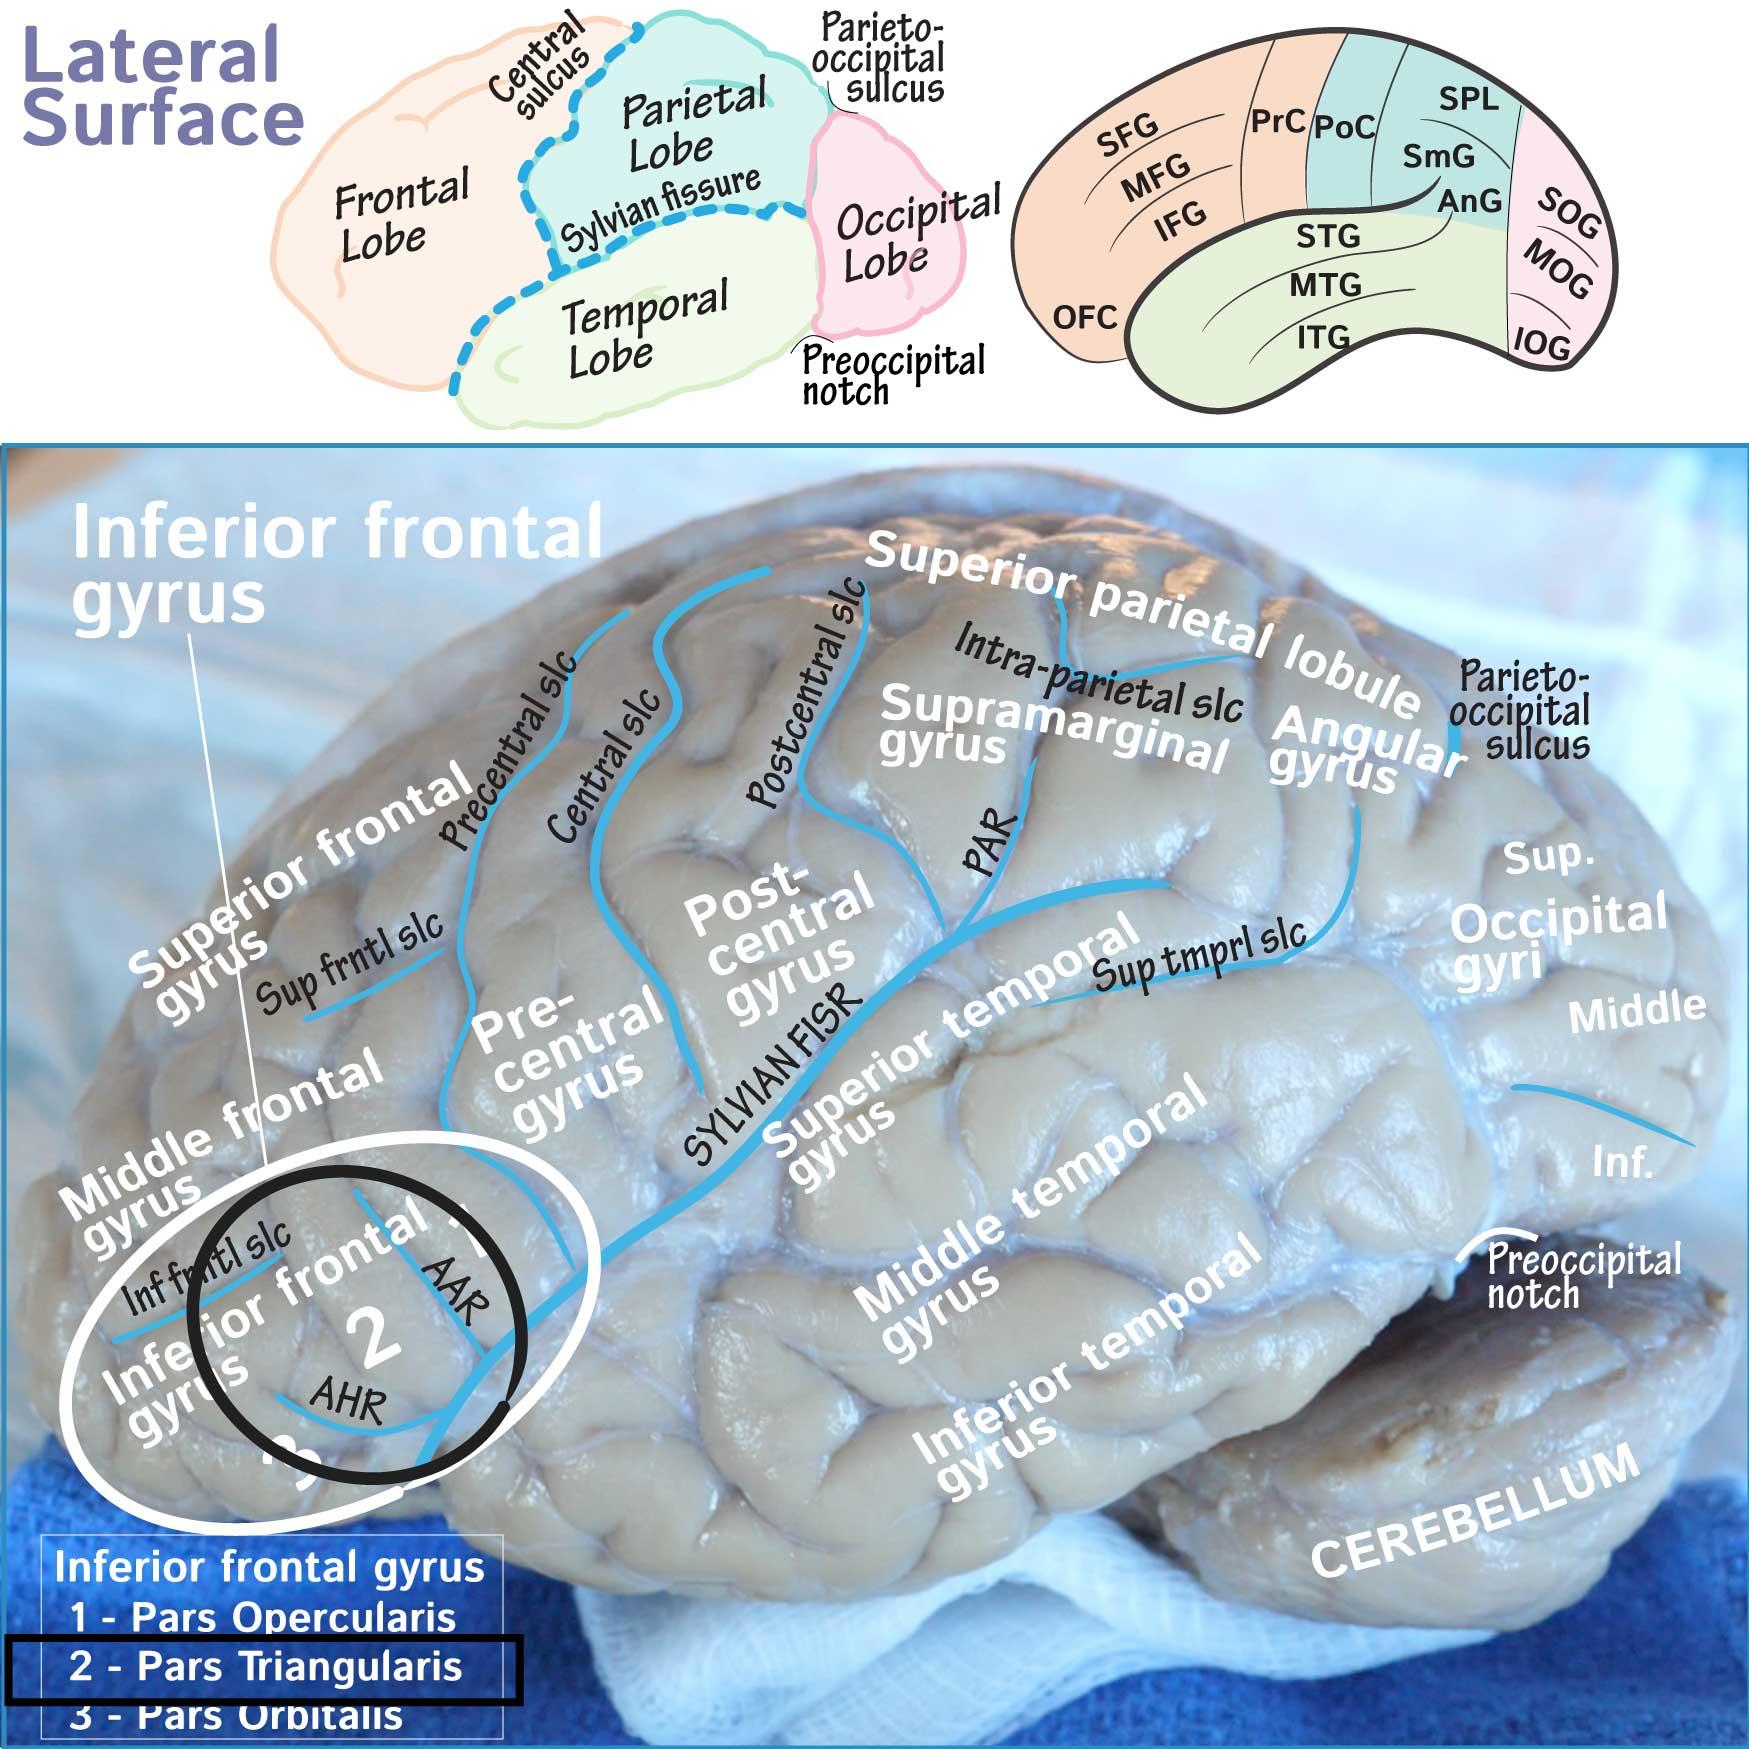 Neuroanatomy Glossary Inferior Frontal Gyrus Triangular Part